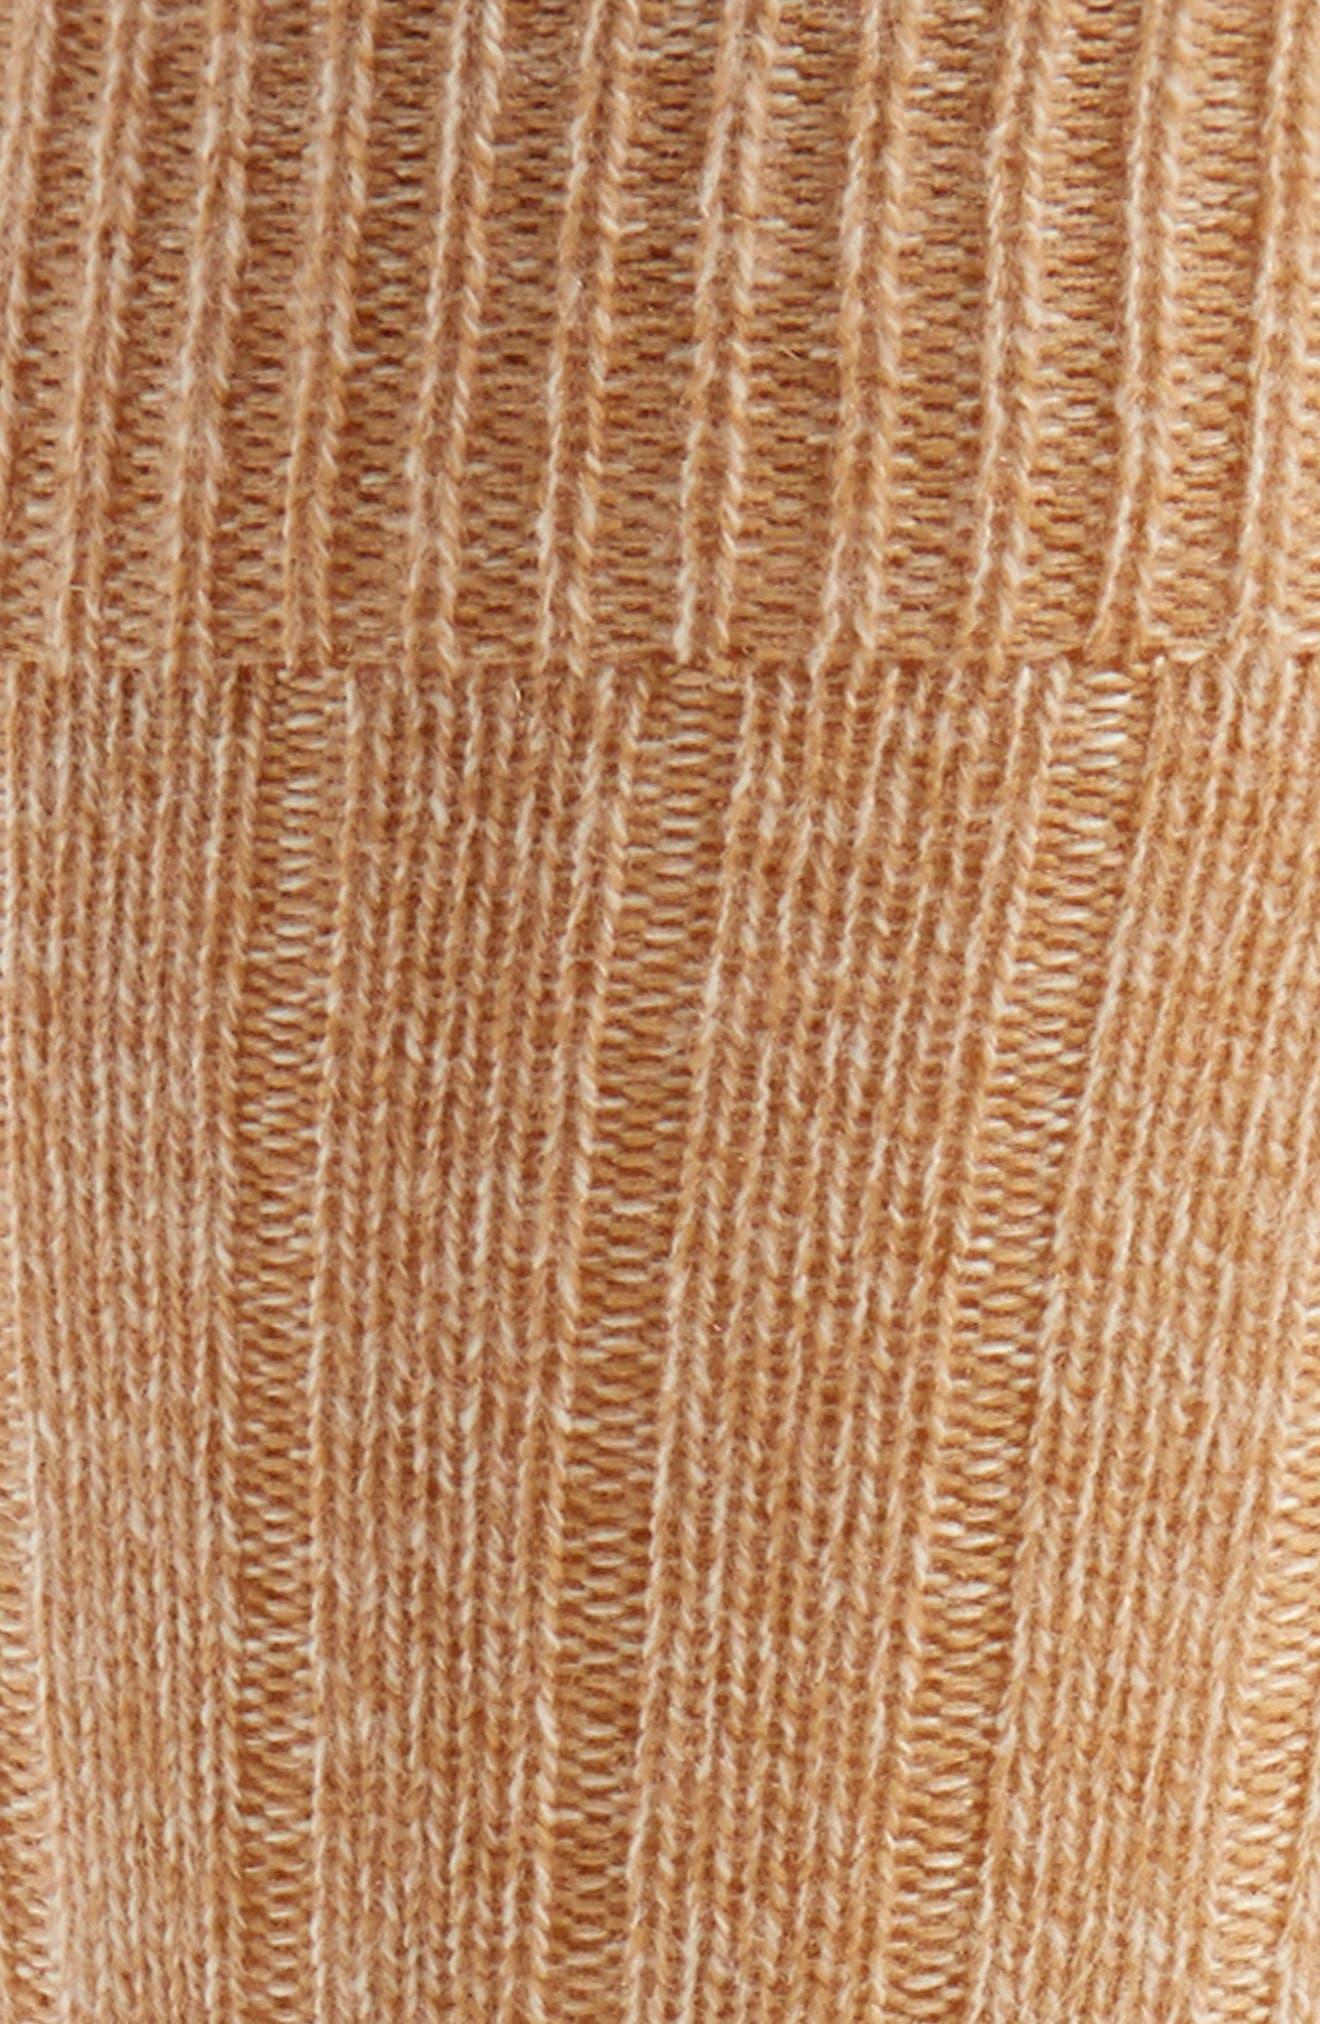 'Waddington' Cashmere Blend Mid Calf Socks,                             Alternate thumbnail 12, color,